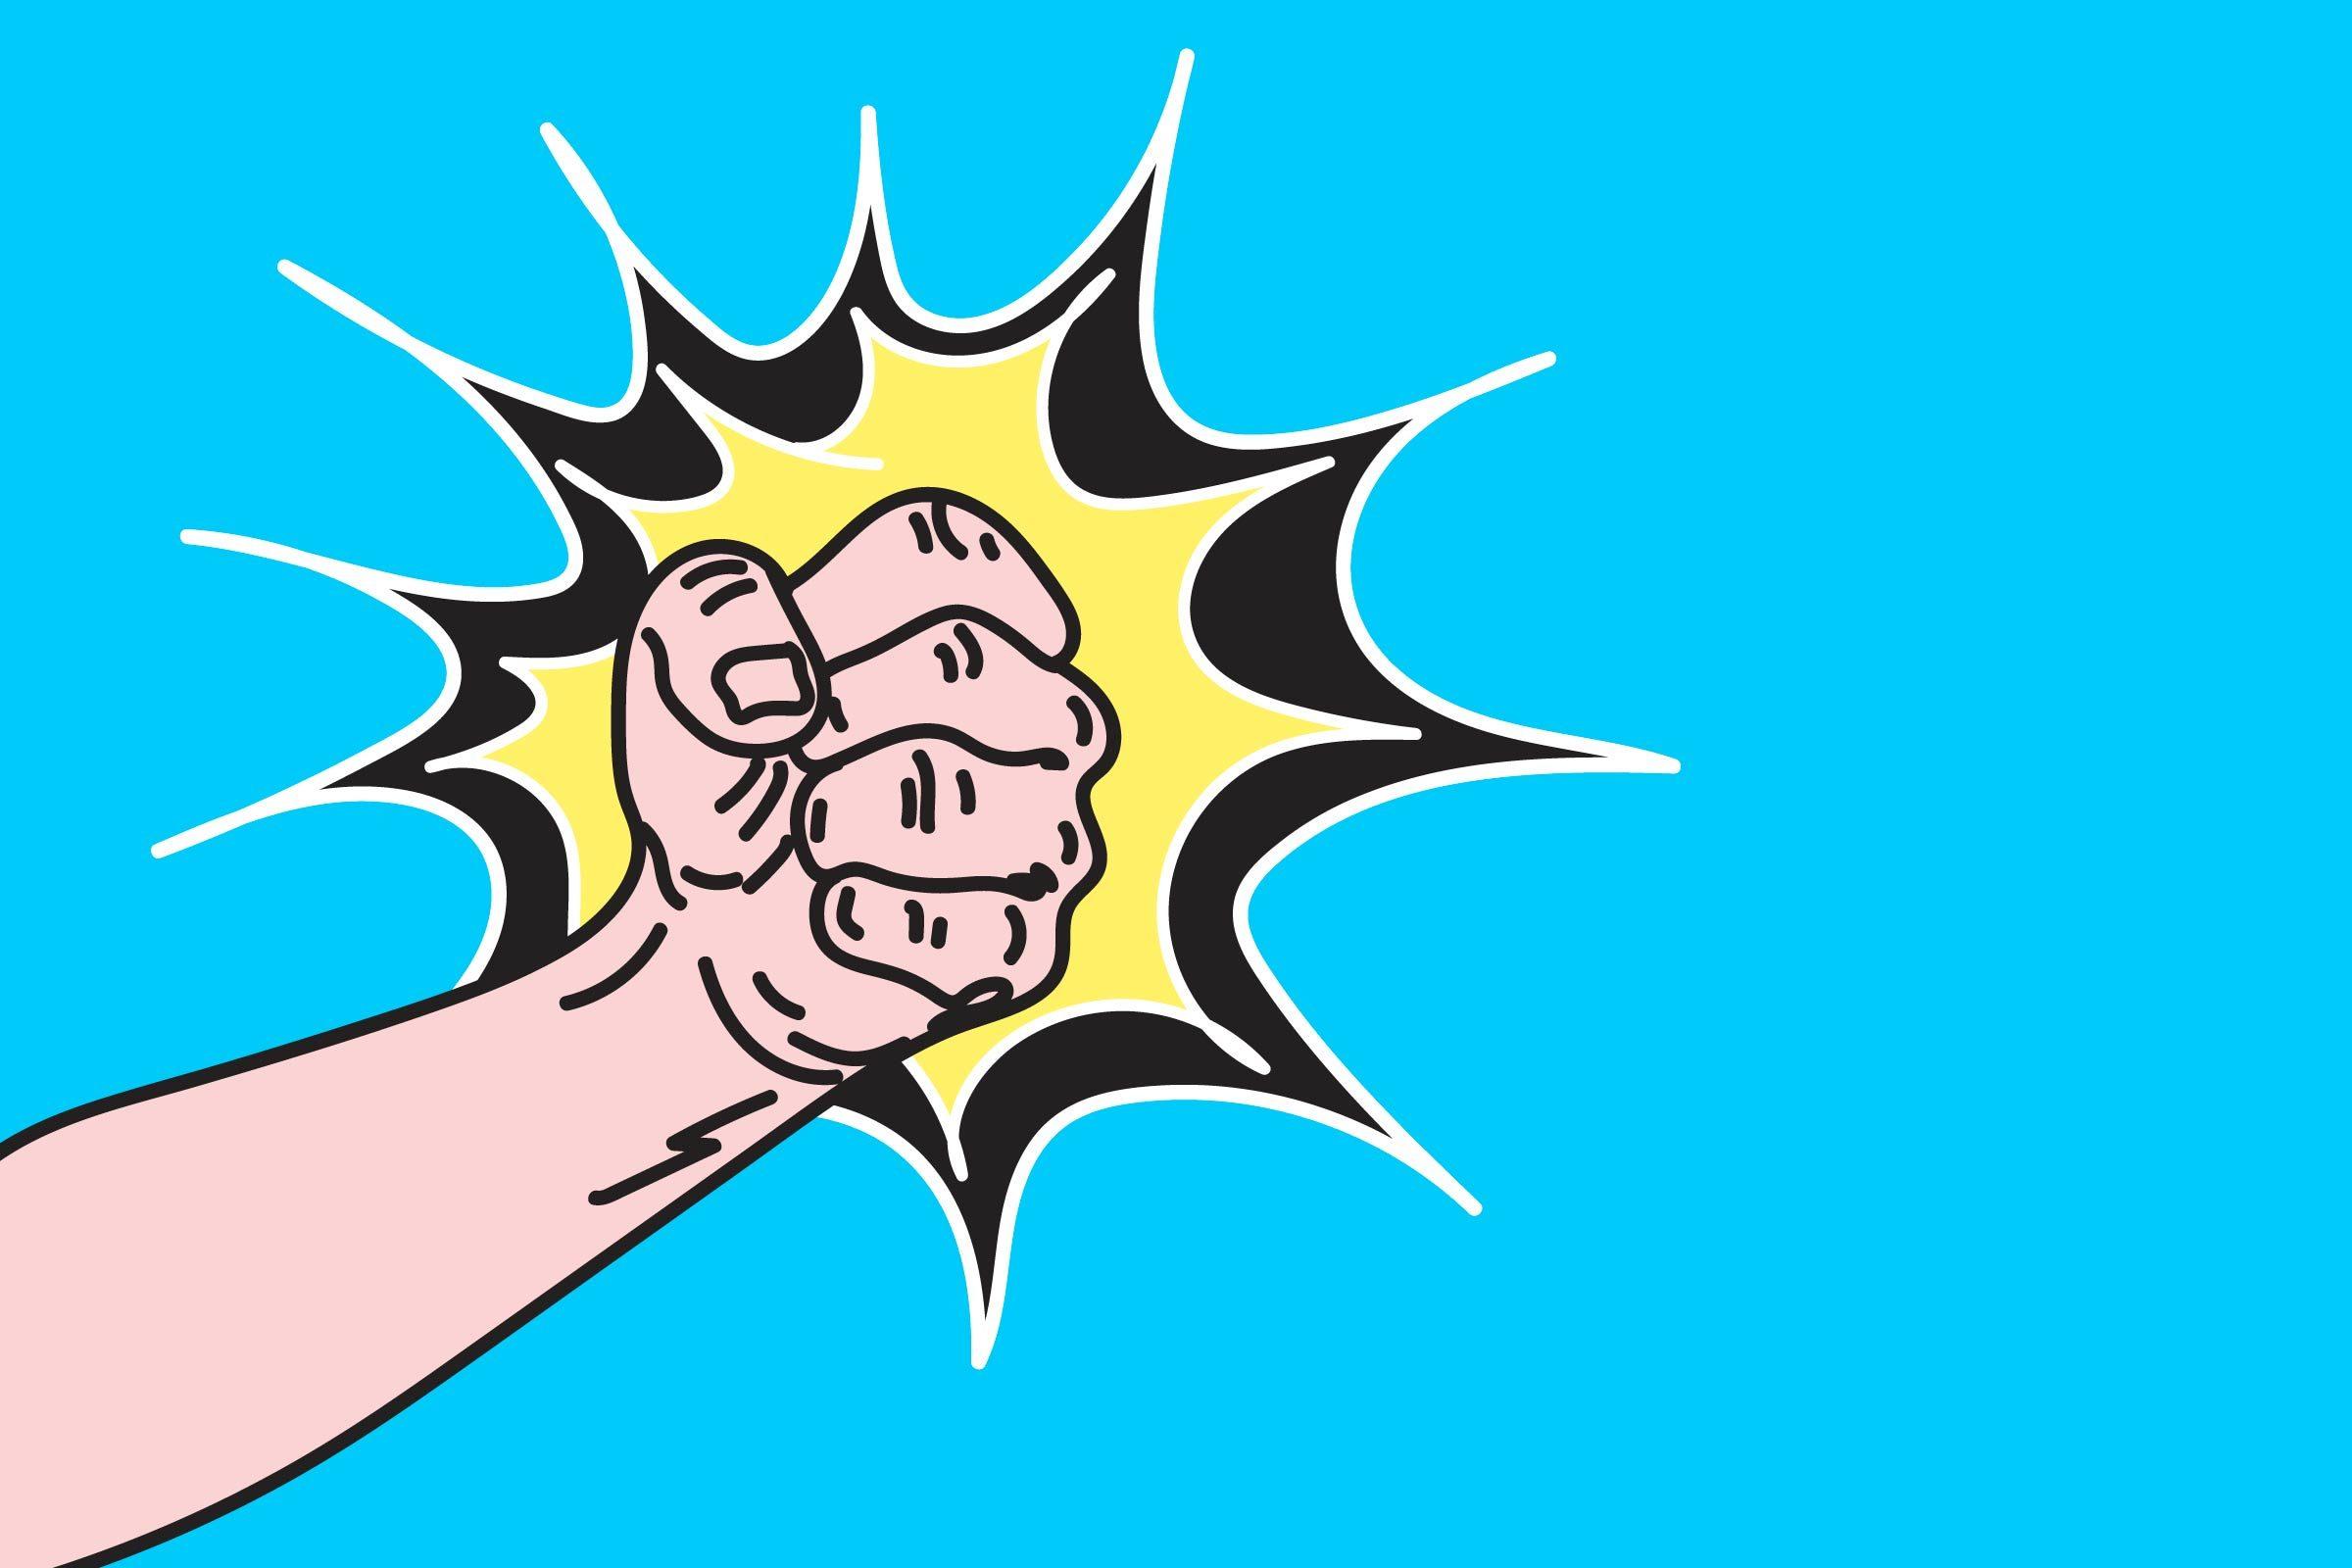 illustration of closed fist